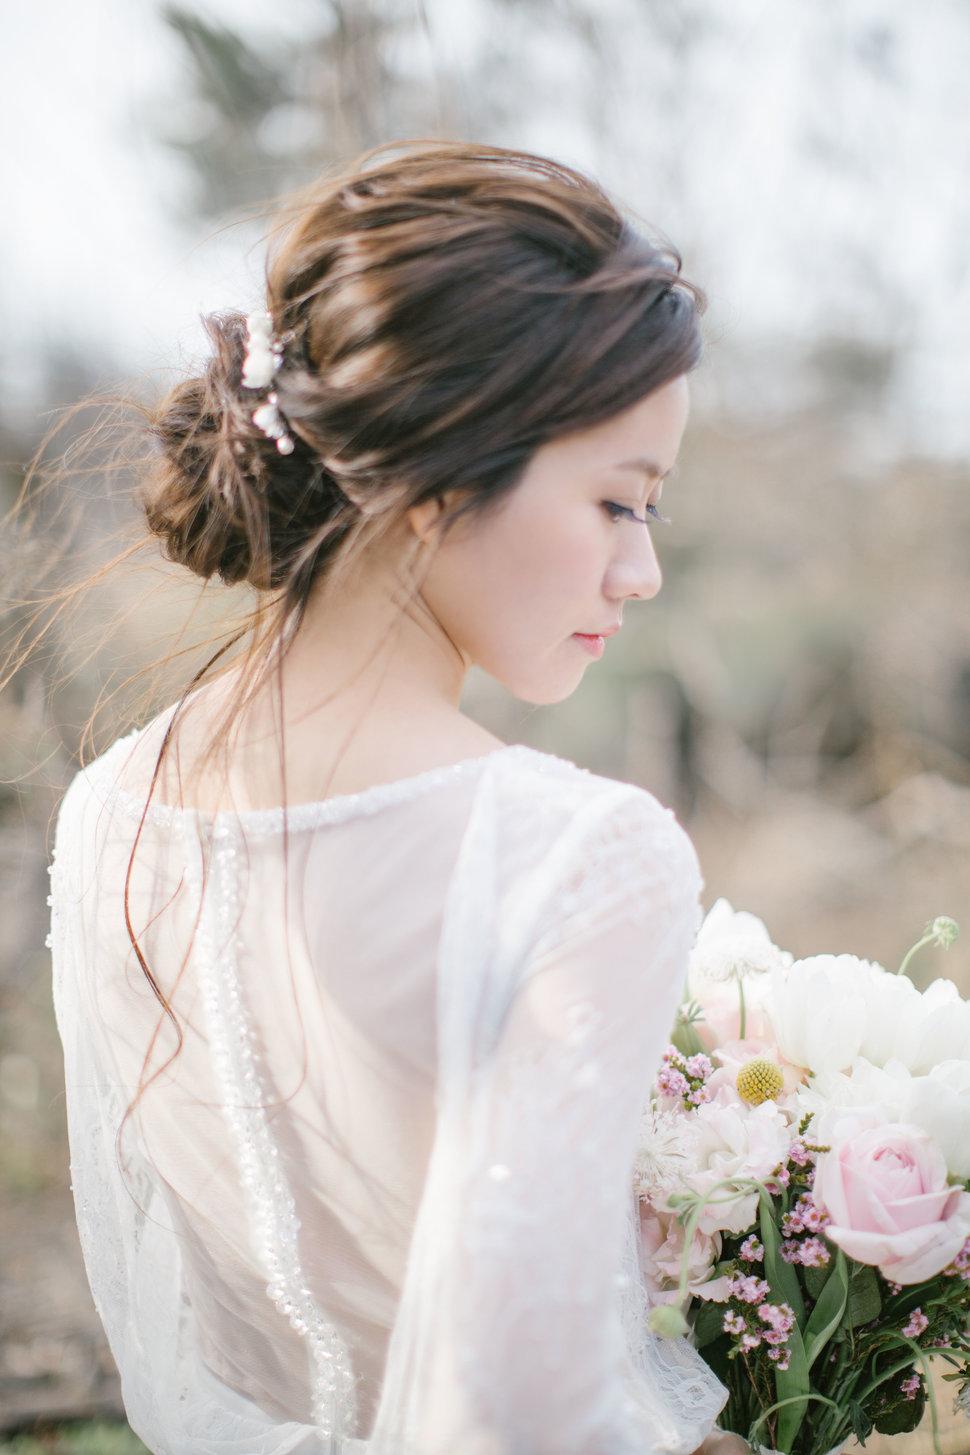 TC6A2645-1 - 台中新秘煒煒Wei's Makeup - 結婚吧